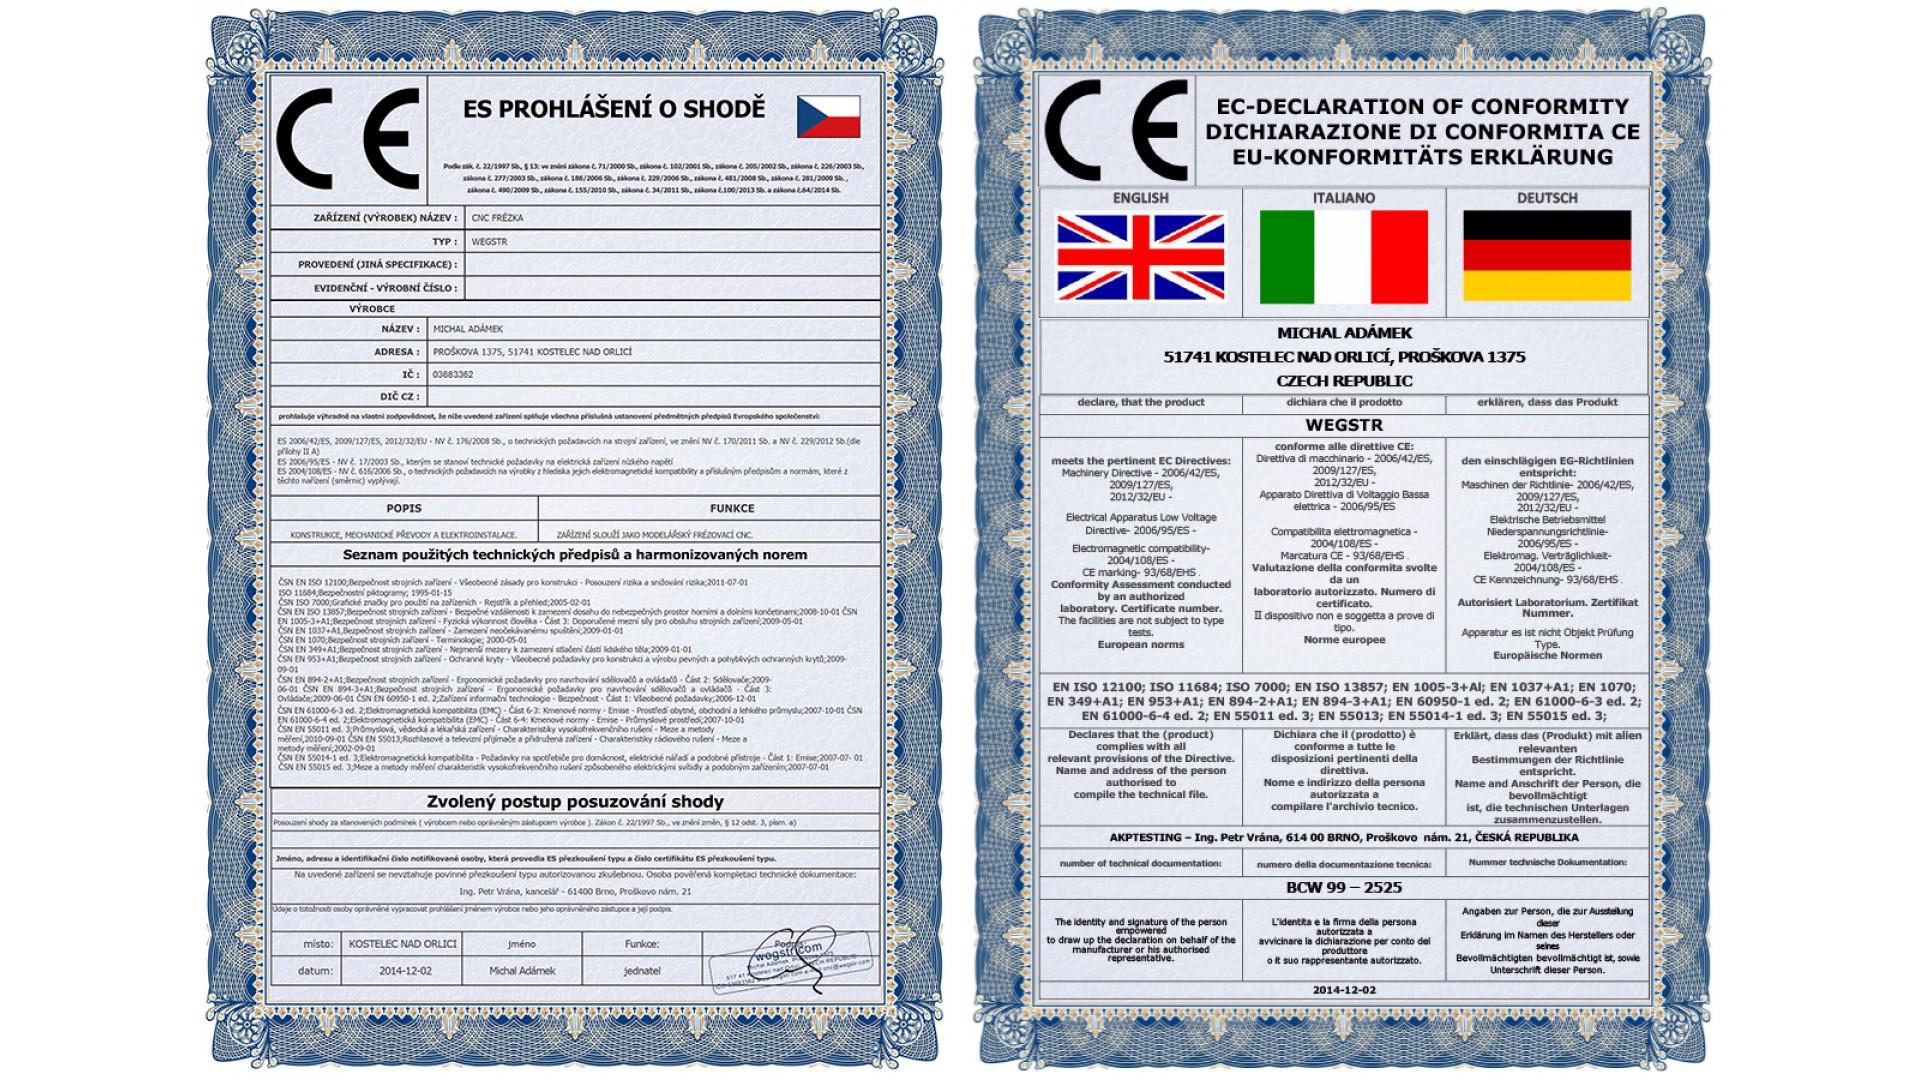 CNC Wegstr (English)